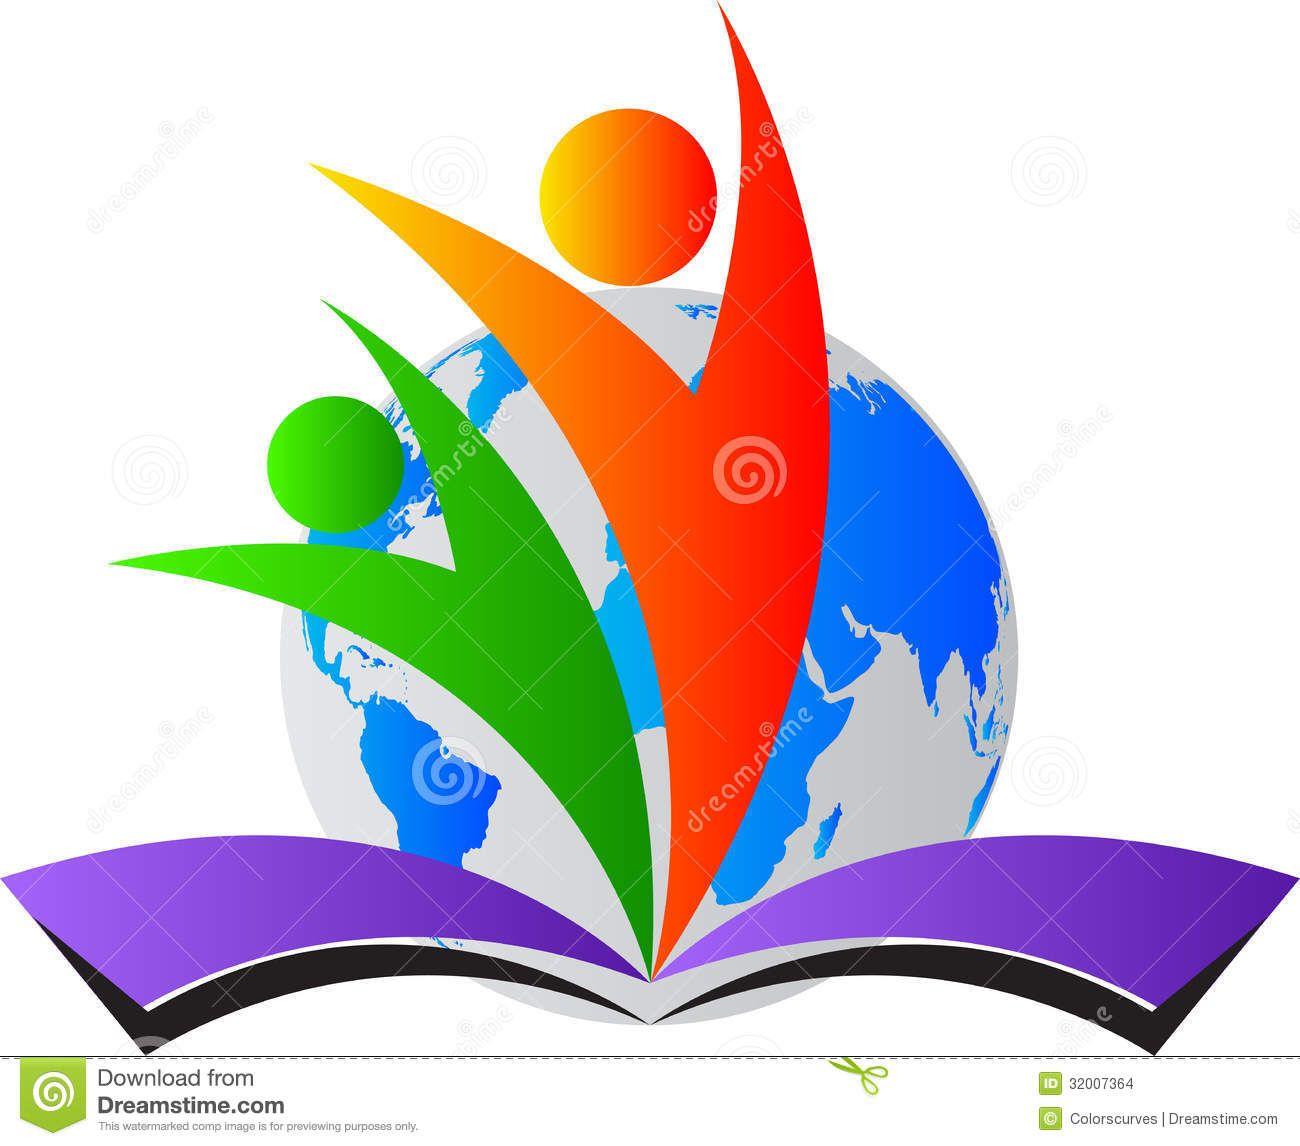 education logo - Google Search   logo inspiration   Pinterest ...